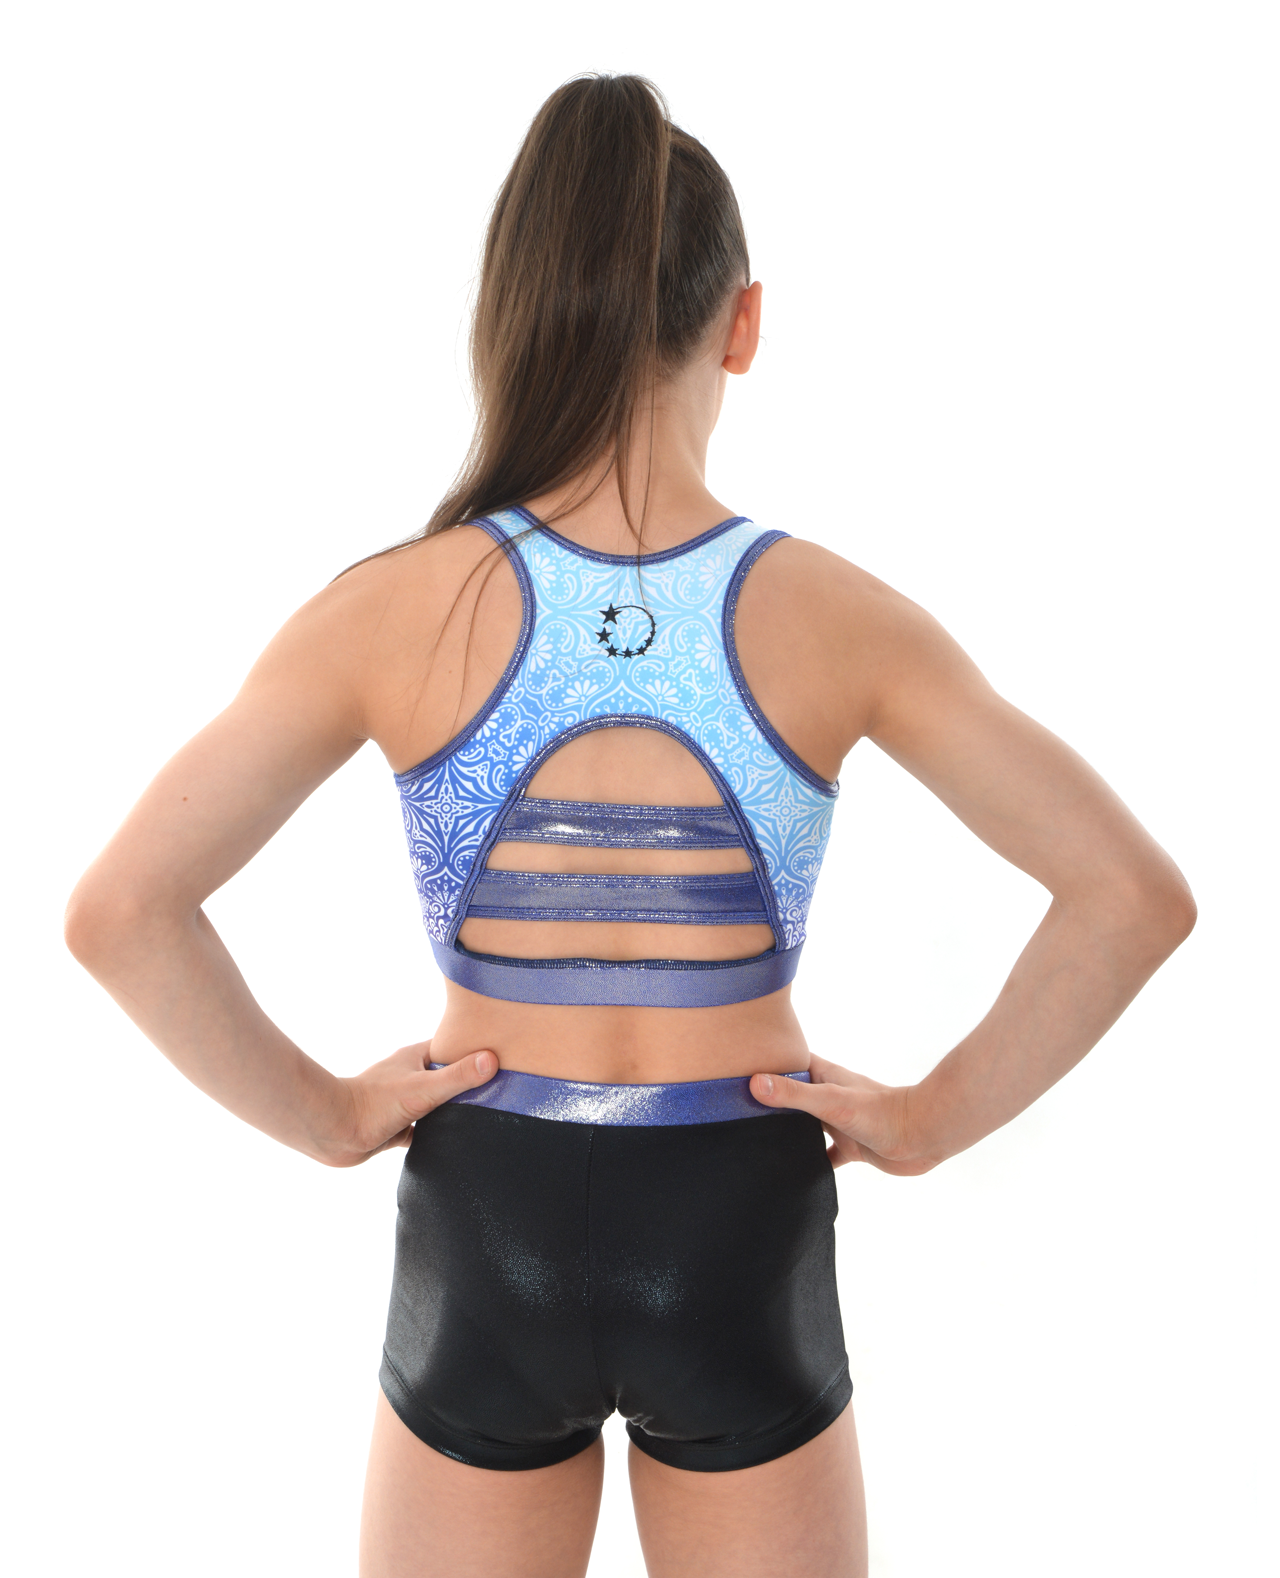 gymnastics cheerleading dance cropped navy blue mandala patten top and shorts